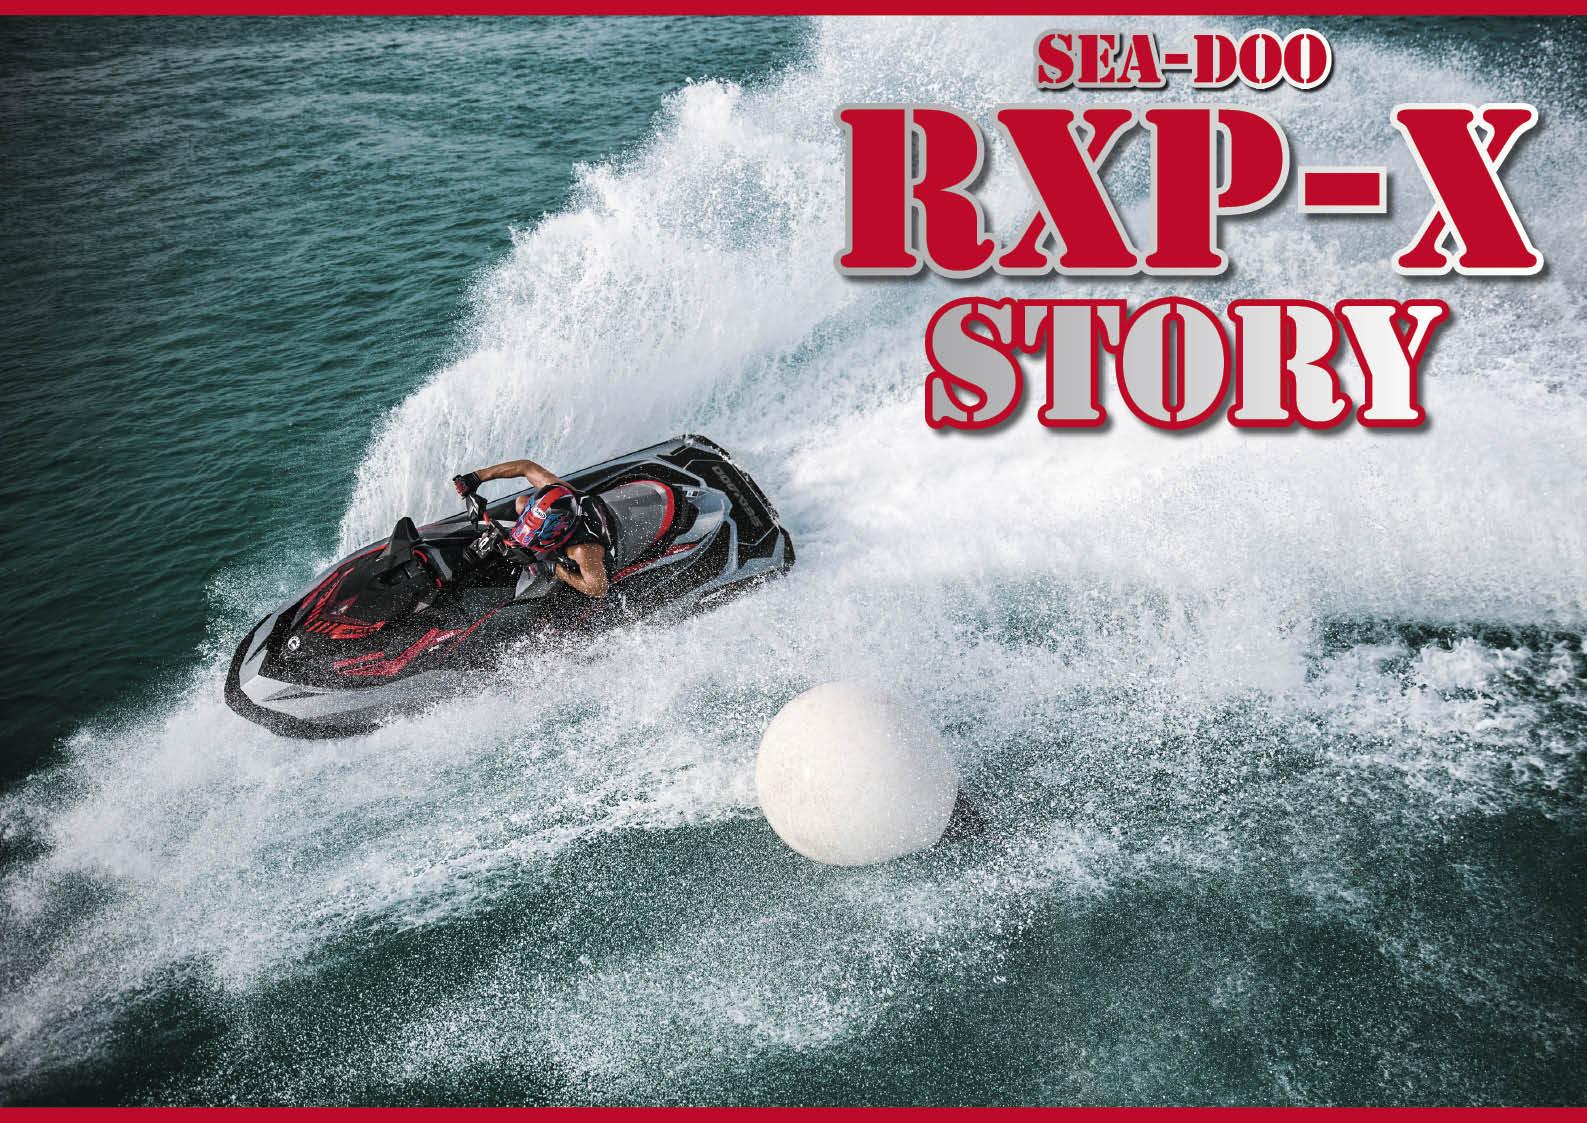 SEA-DOO RXP-Xの強さの秘密を検証する ジェットスキー(水上バイク)